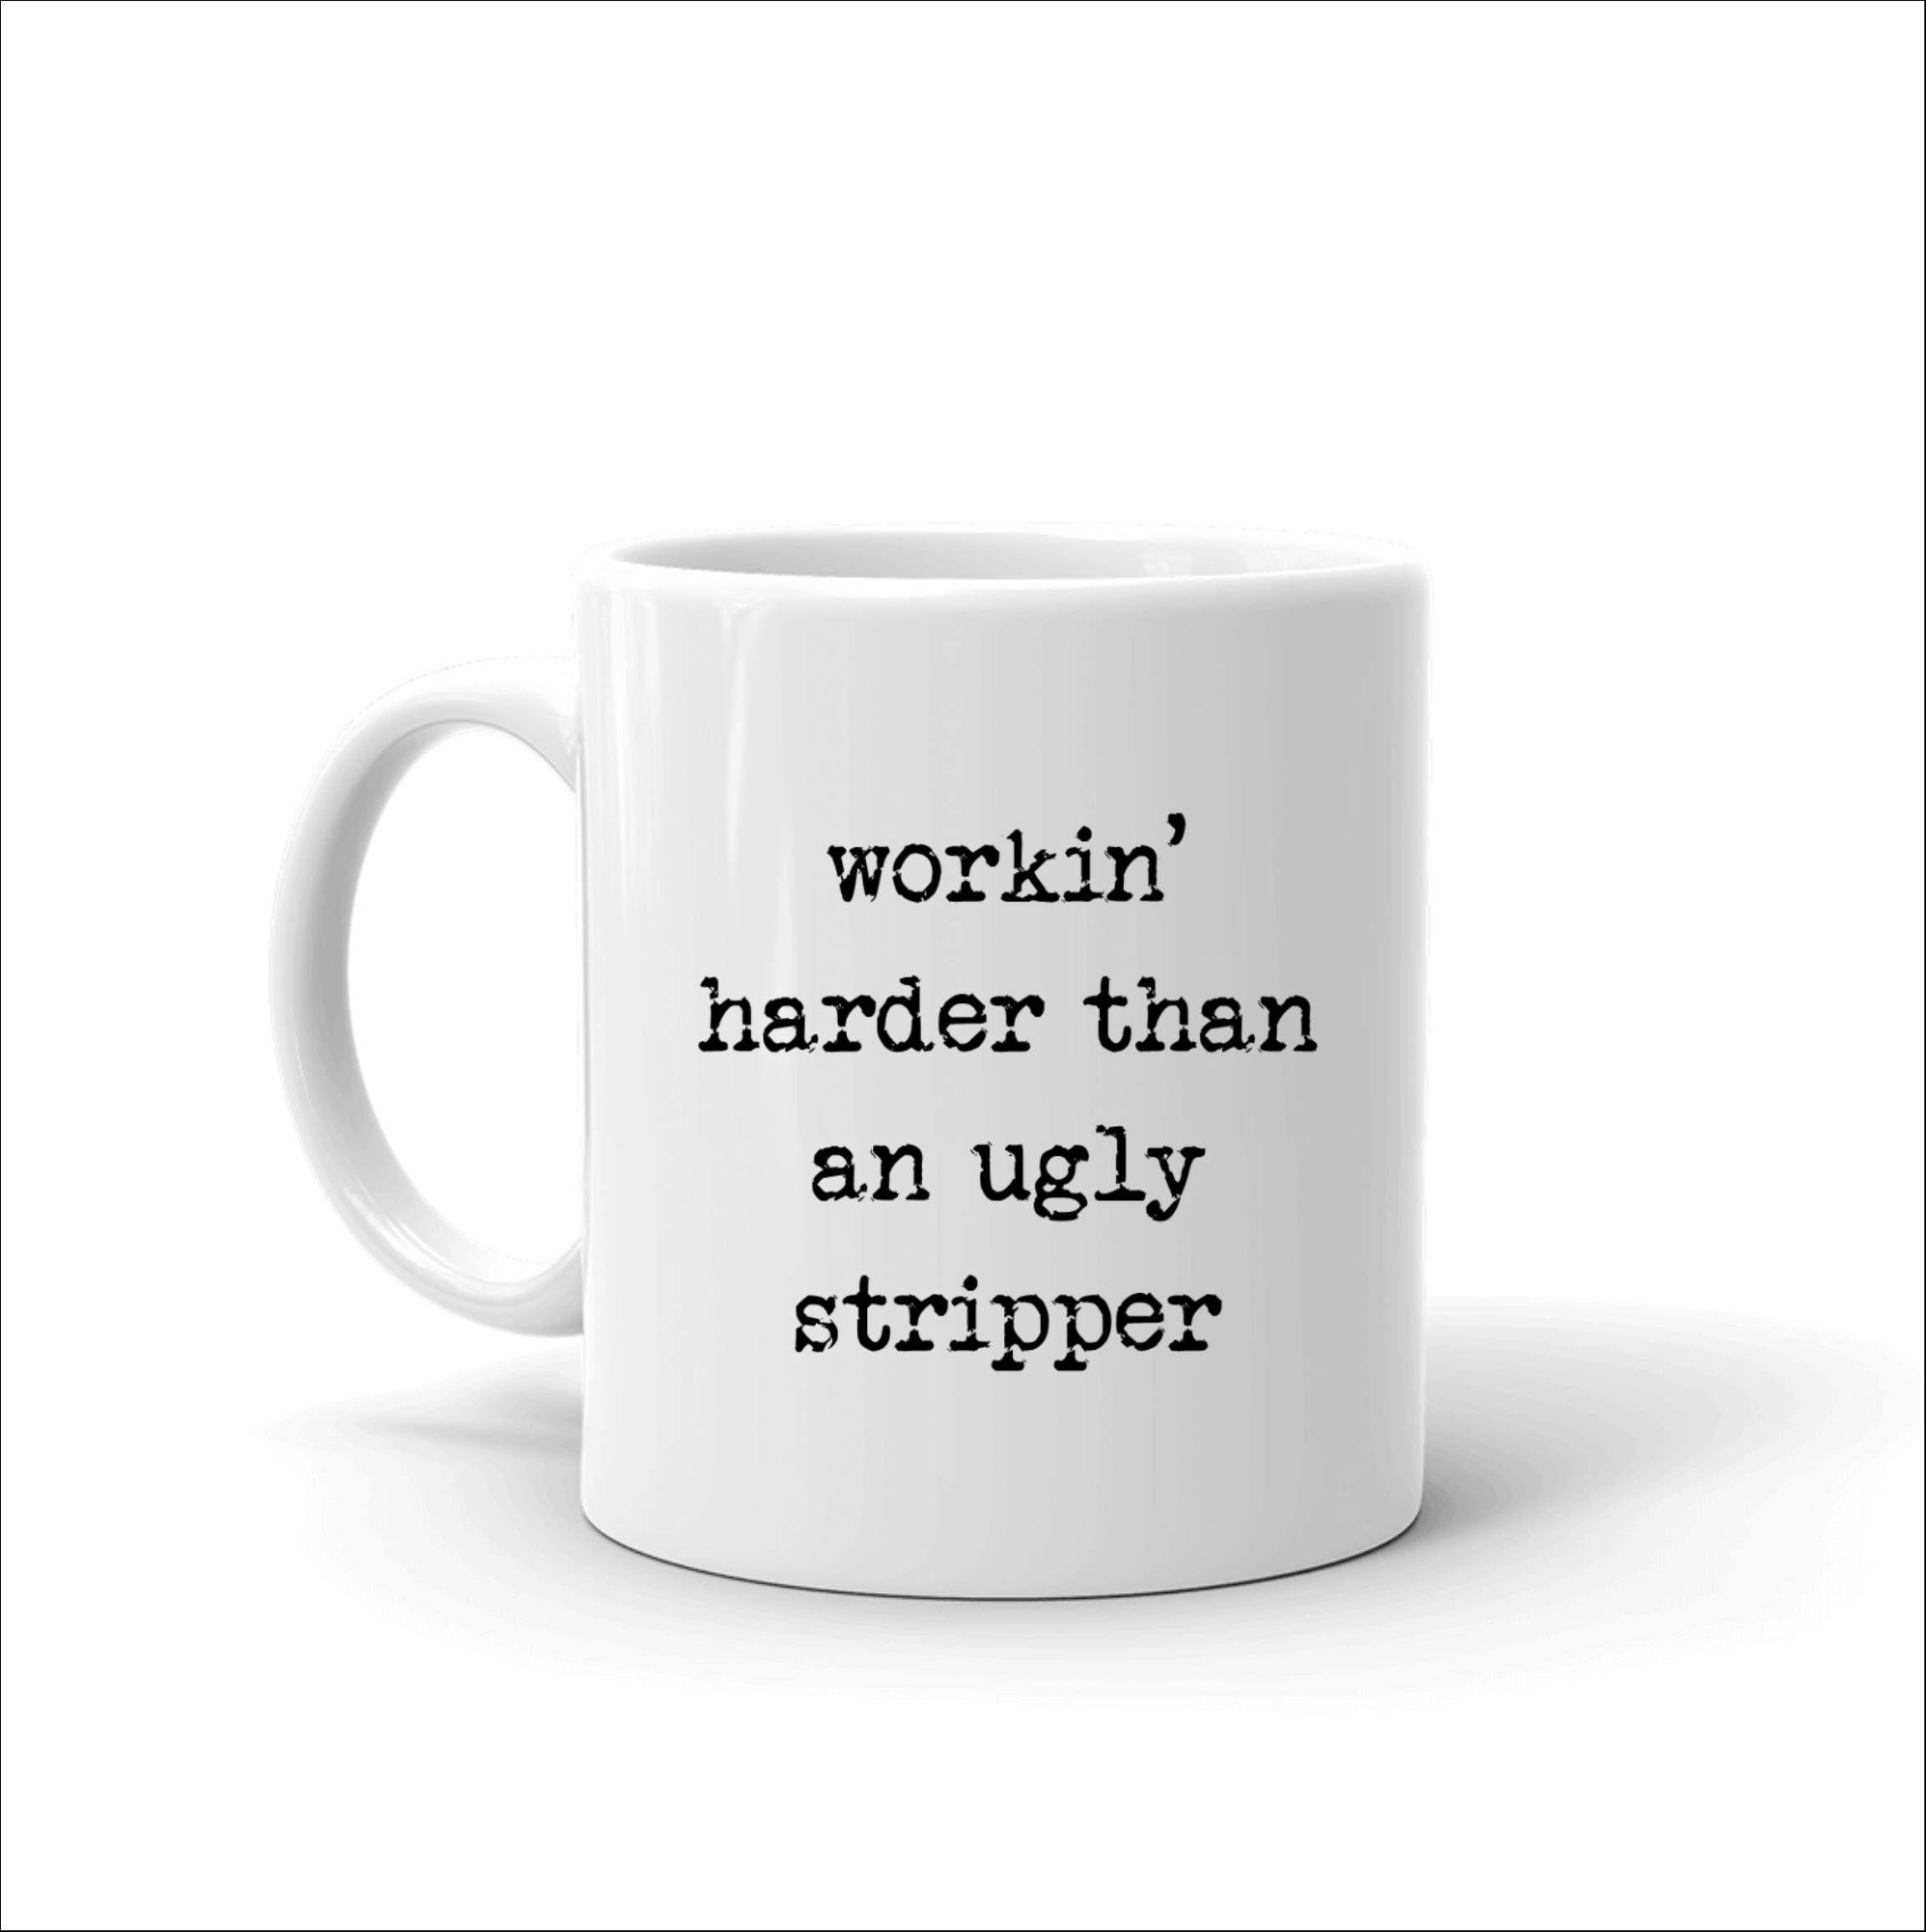 b8e197c8097 Funny Work Mug, Work Coffee Mug, Work Team Gifts, Office Gifts, Mug for  Coworkers, Sarcastic Mug, Work Hard Mug, Stripper Mug, Sarcasm Mug, by  SimplyBrewed ...